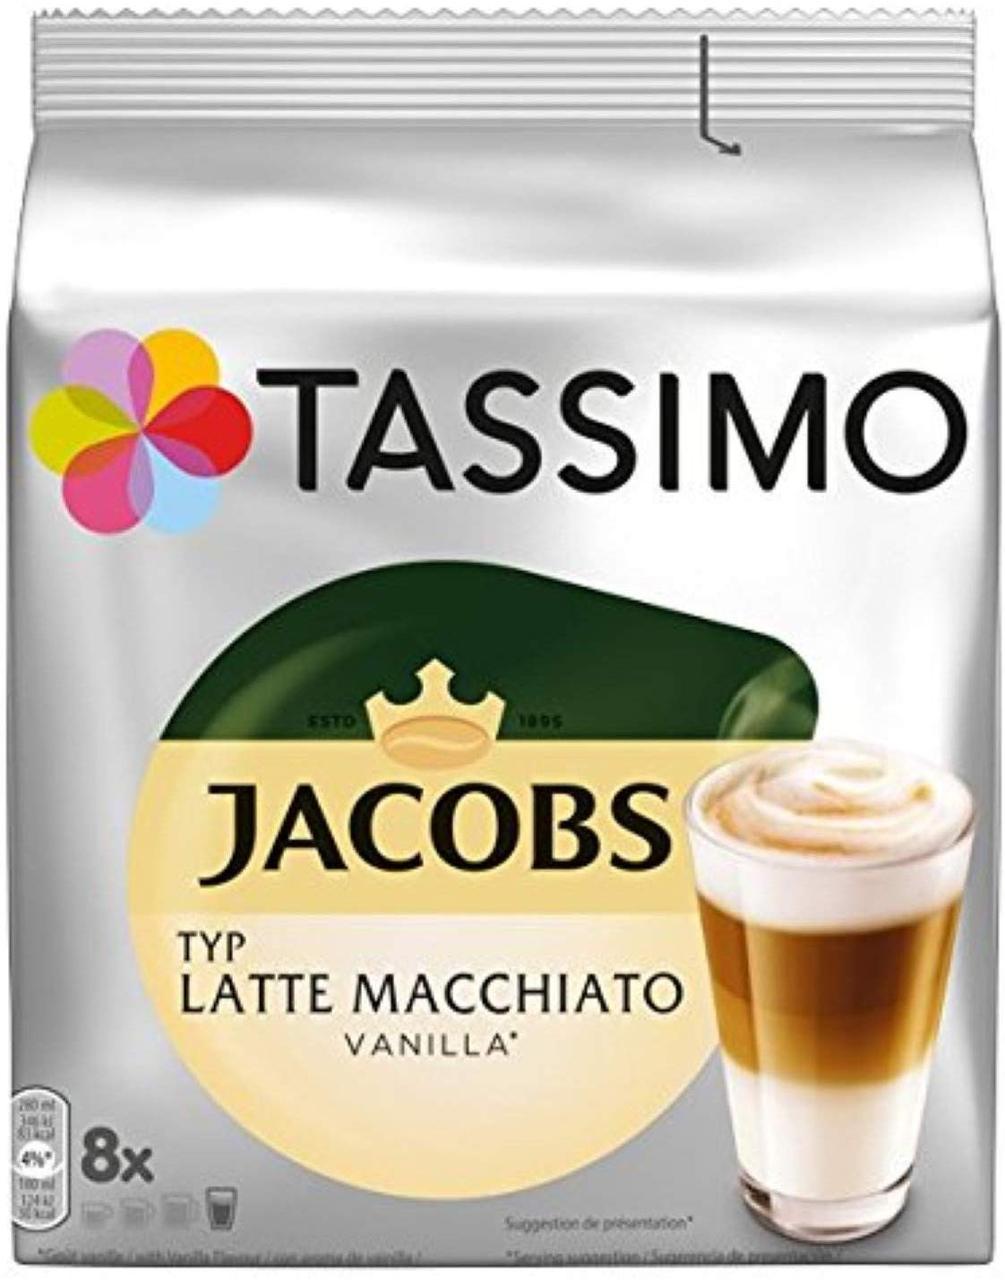 Кофе в капсулах Tassimo Jacobs Latte Macchiato Vanilla 16 капсул (8 порц.) Германия (Тассимо), 268г